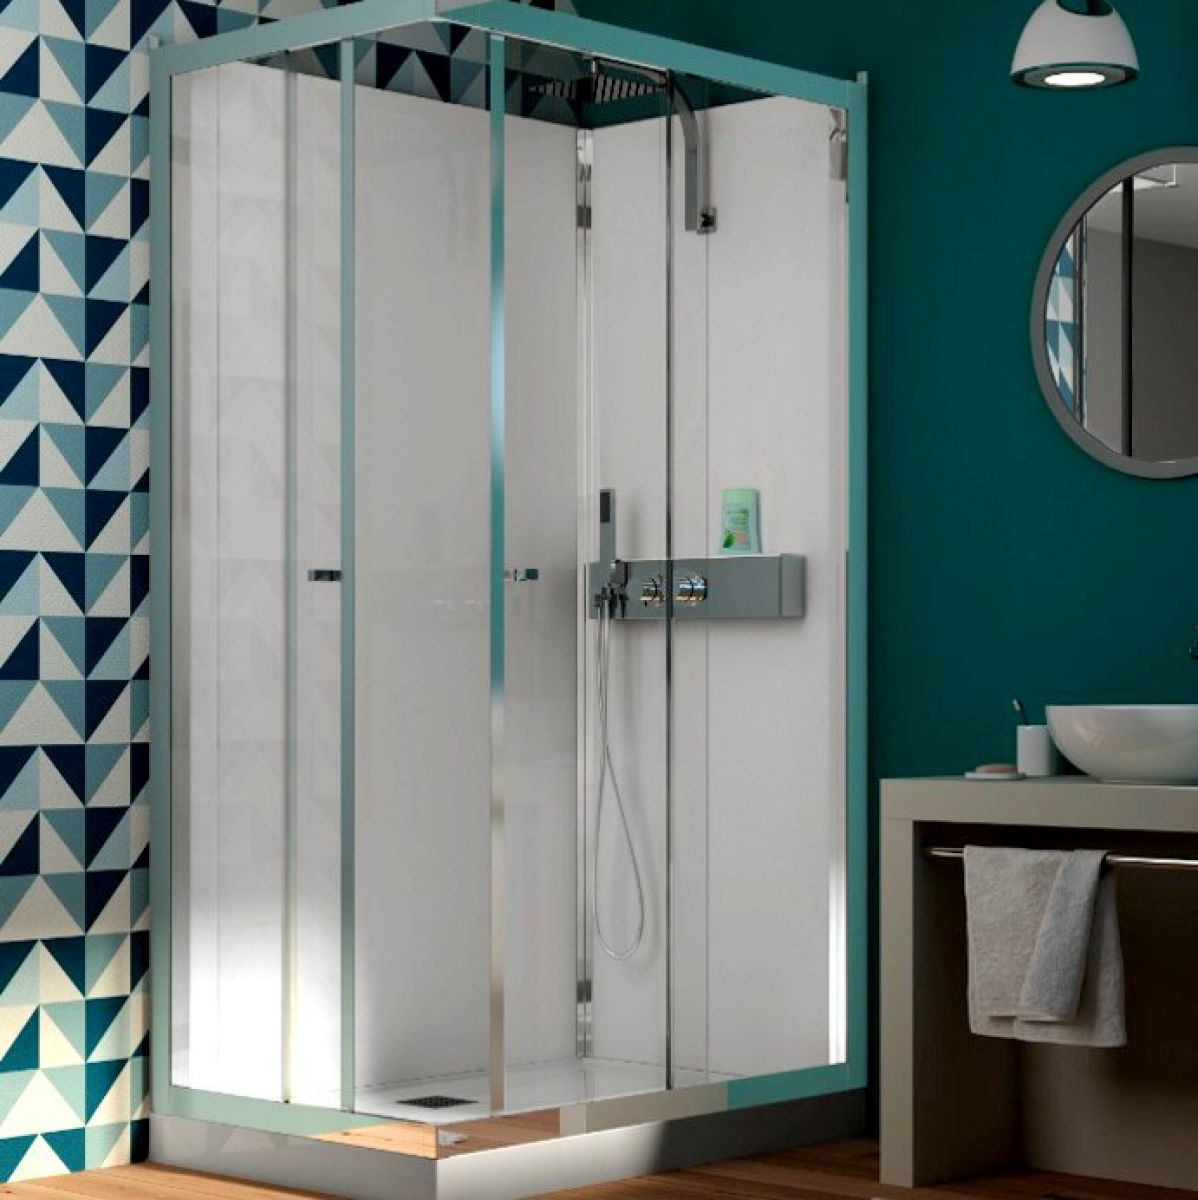 Miraculous Kinedo Eden Corner Shower Cubicle With Sliding Doors Download Free Architecture Designs Scobabritishbridgeorg